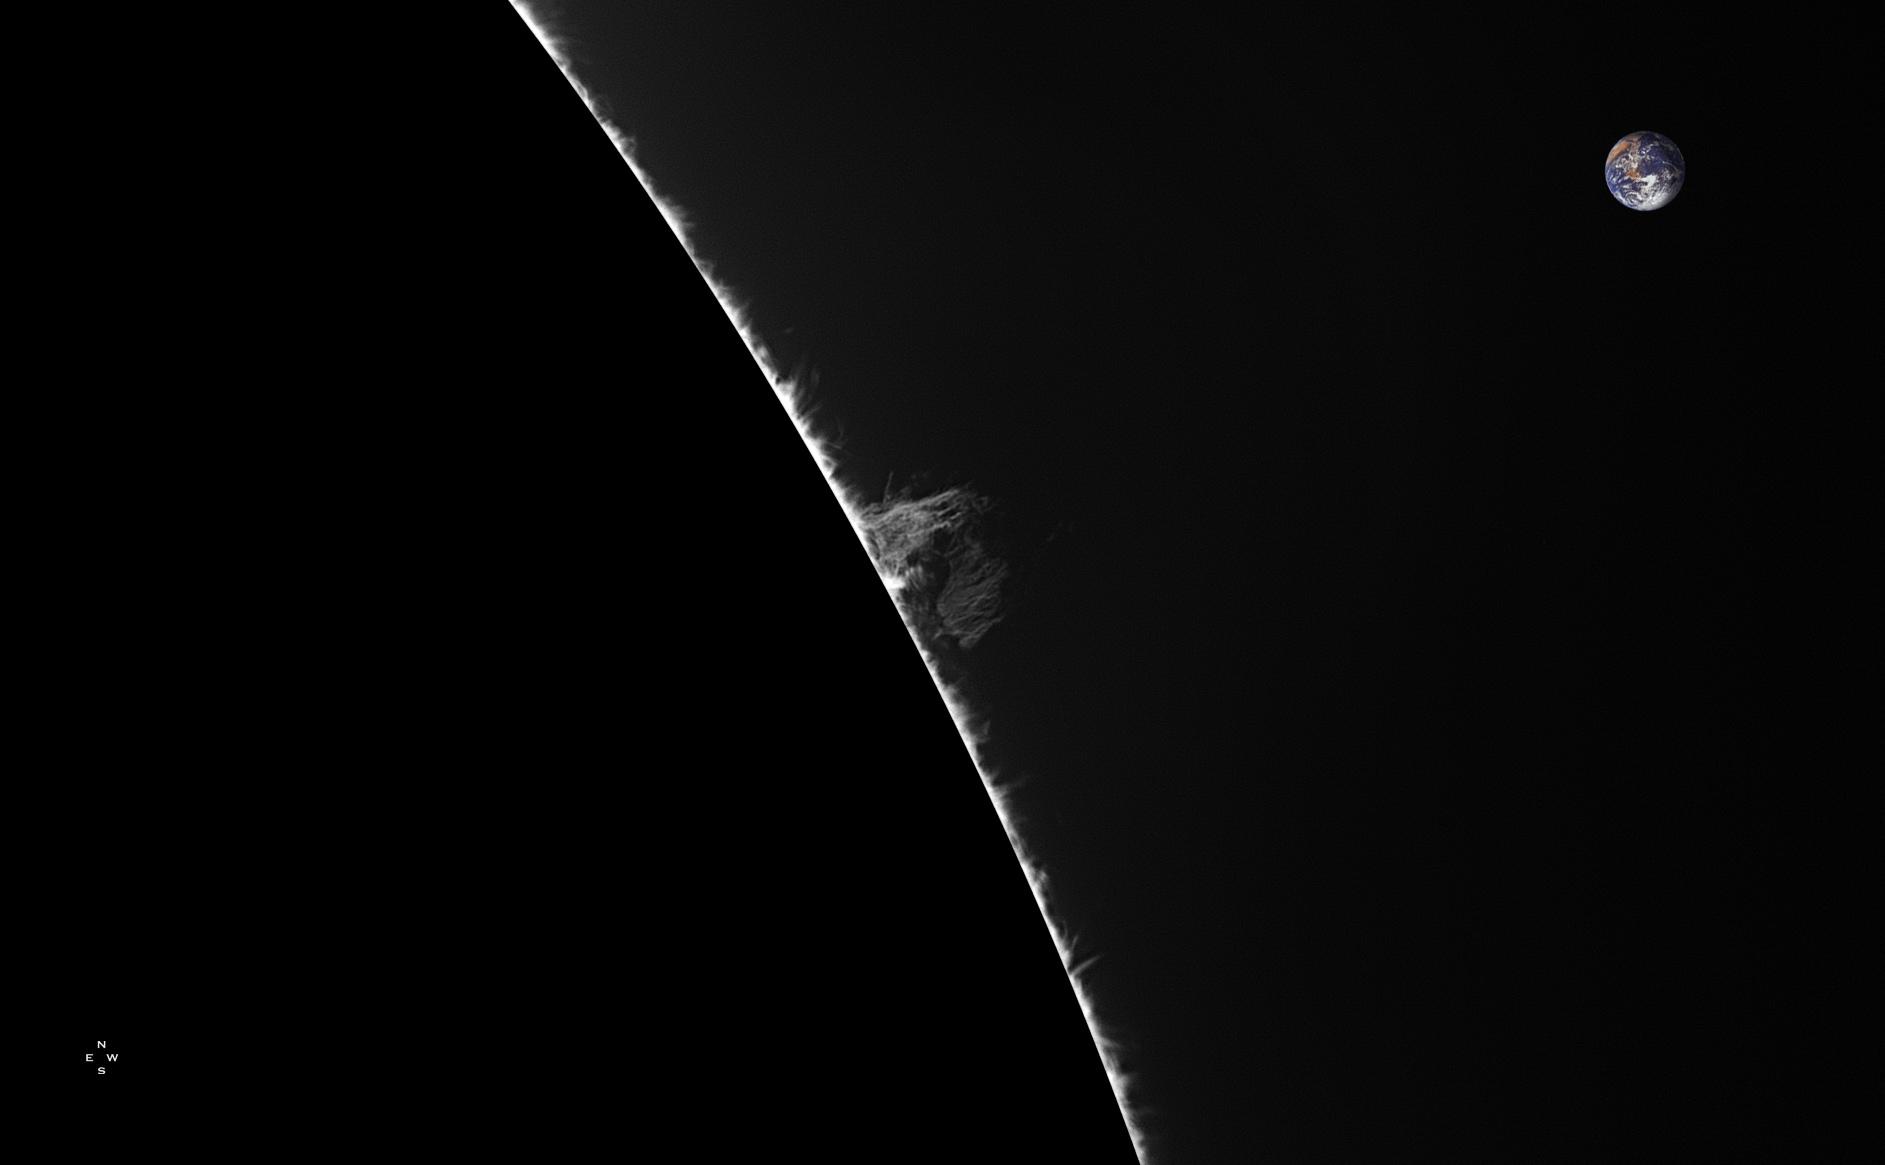 Limbe NW - 67°N - 24 mars 2018